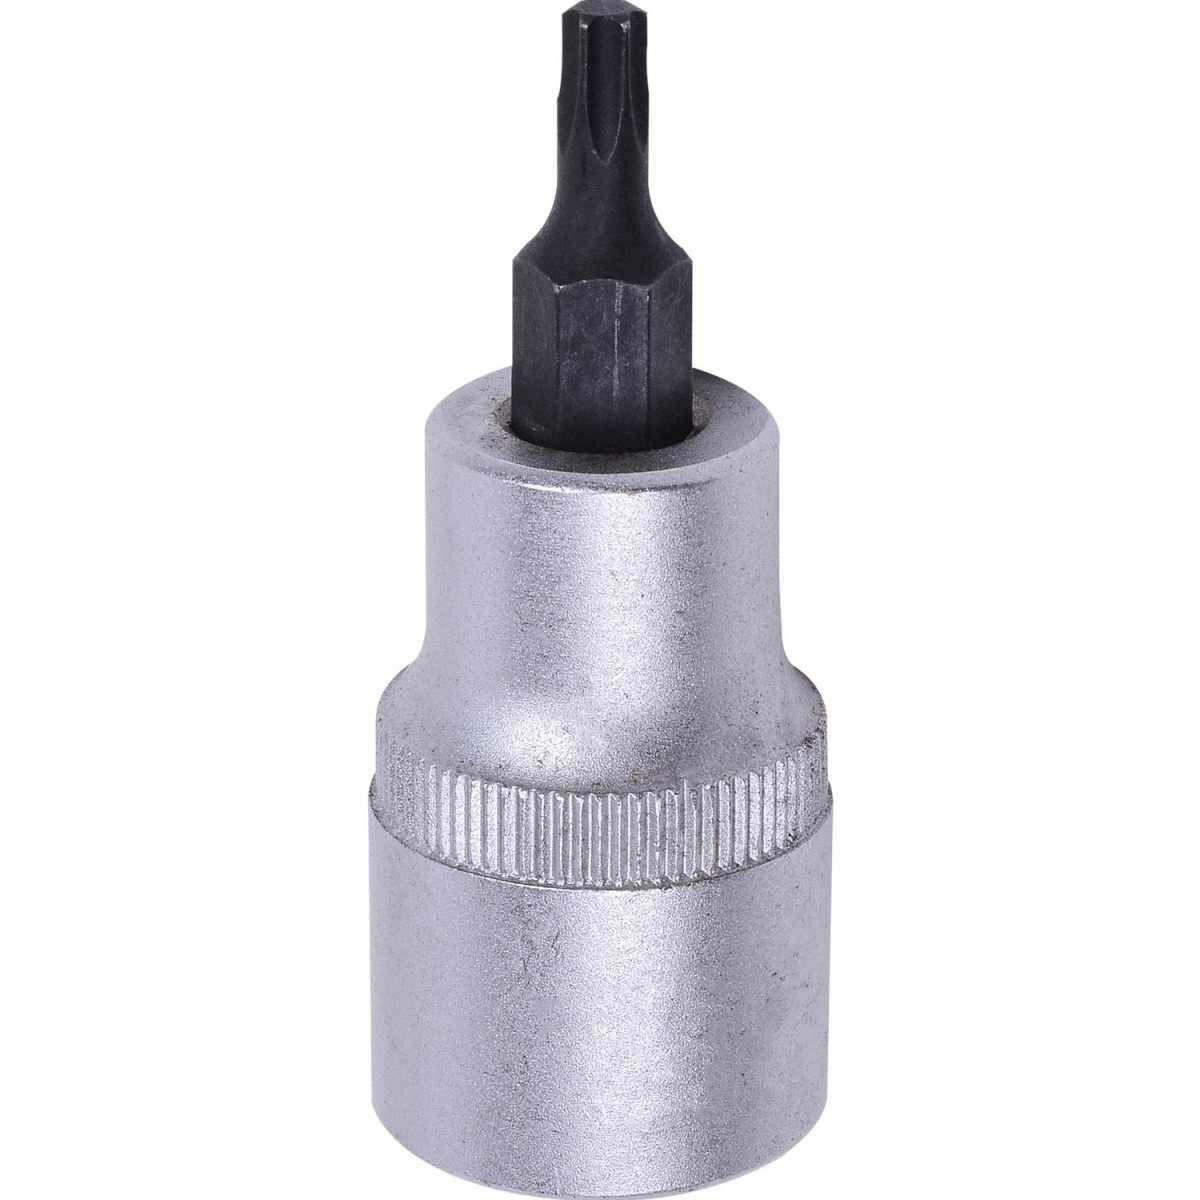 Soquete Hexalobular T 25 Curto Macho Enc. 1/2 060985 Robust